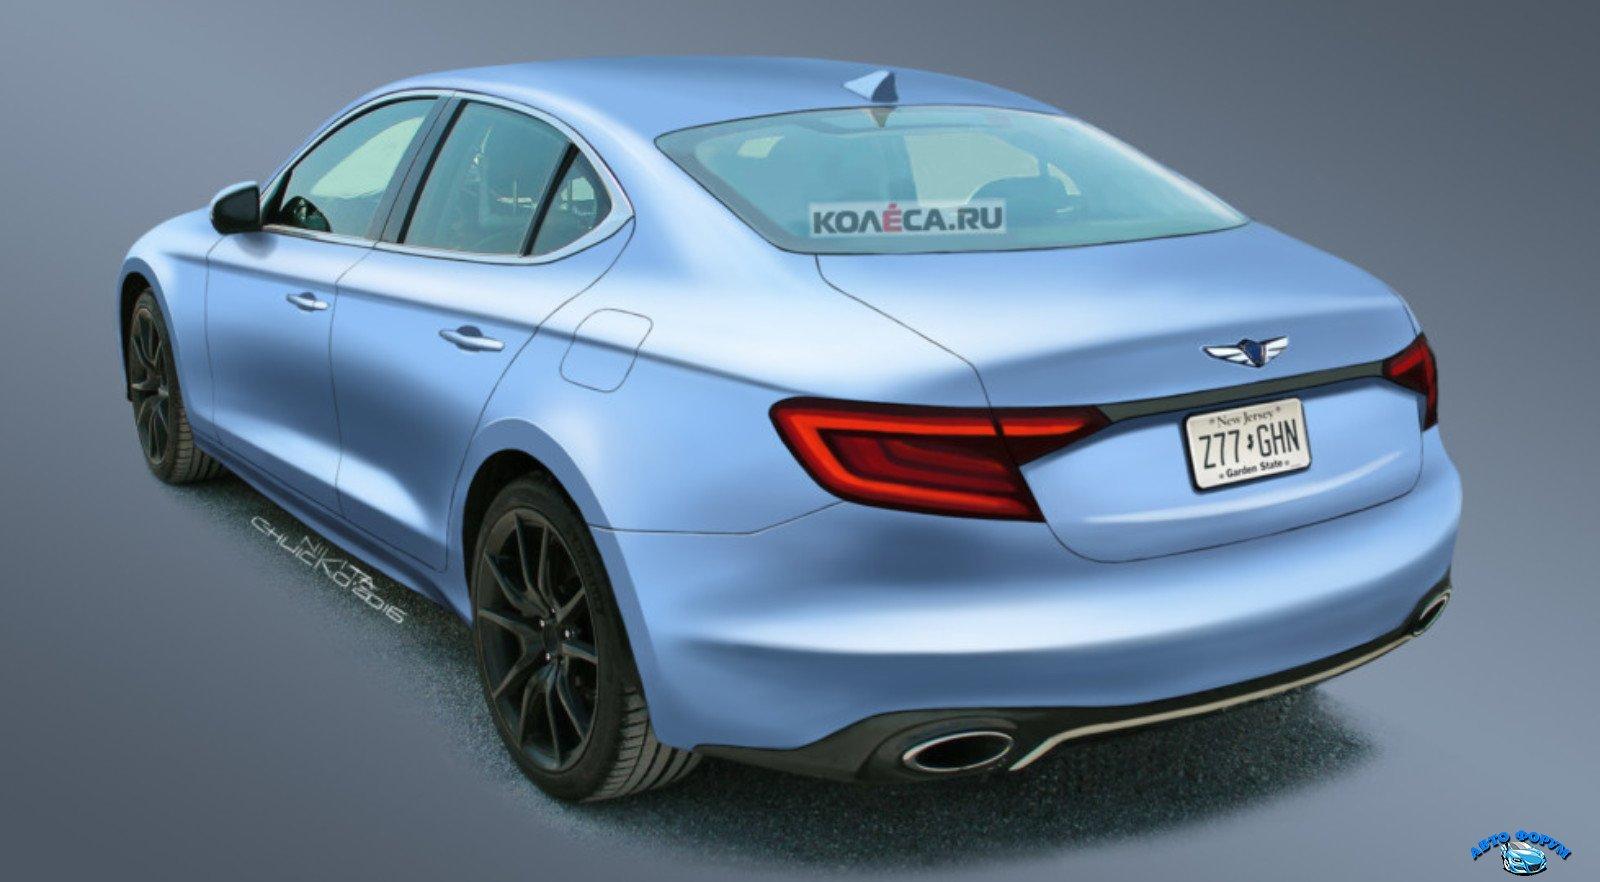 Genesis-G70-rear-980x540-1600x0-c-default.jpg